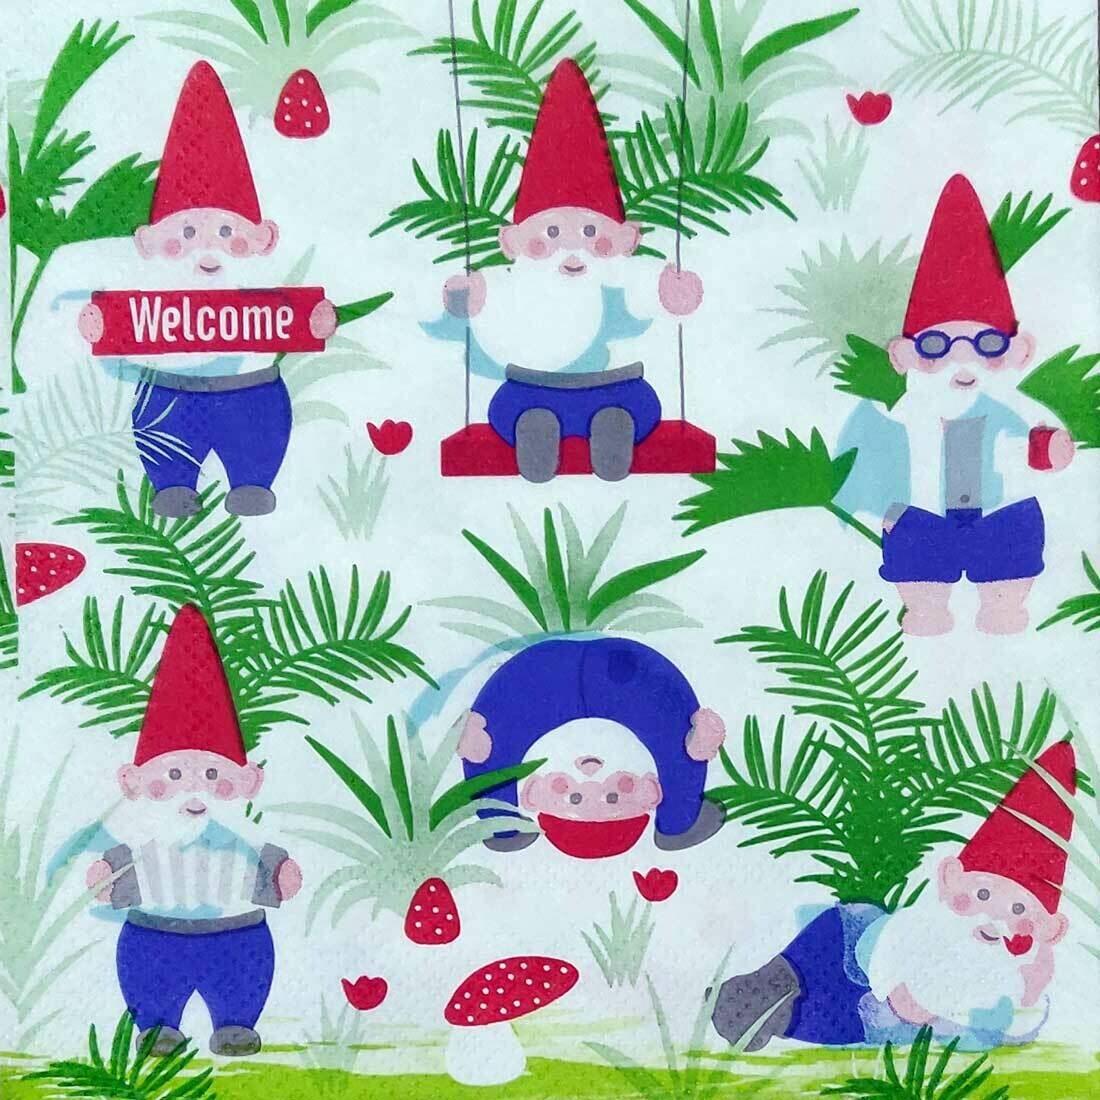 Christmas Print Paper Napkin 13x13 - (Pack of 20)